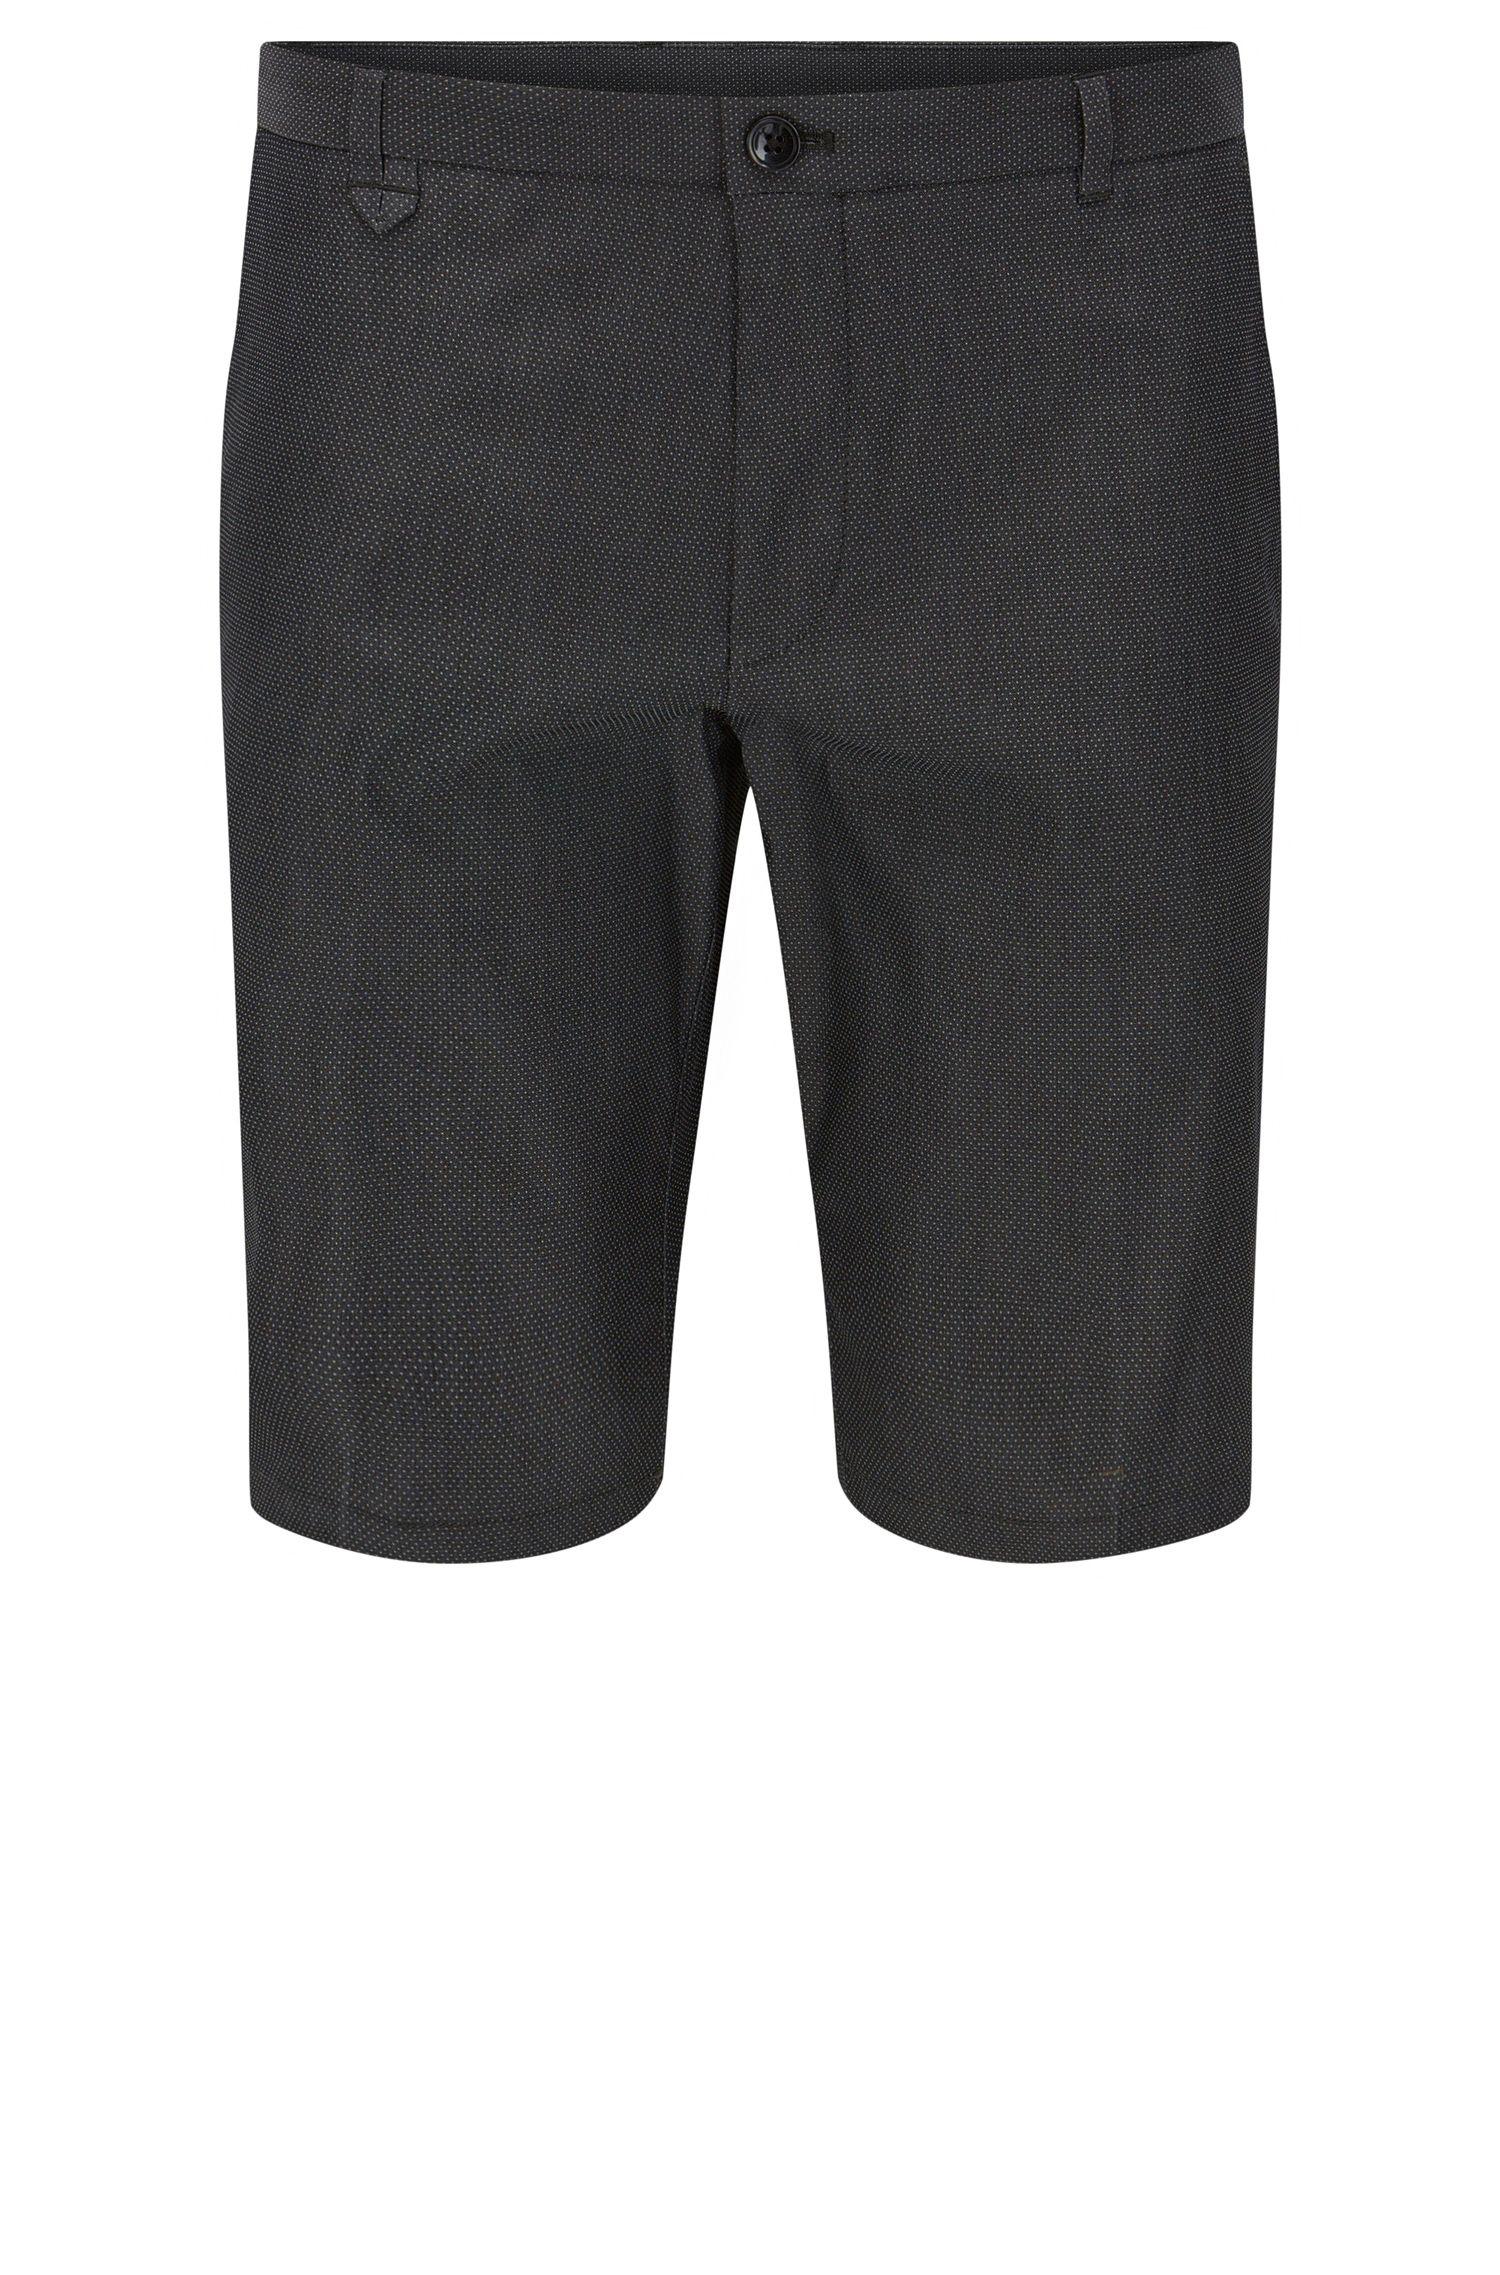 Pindot Stretch Cotton Blend Short, Slim Fit | Hano3